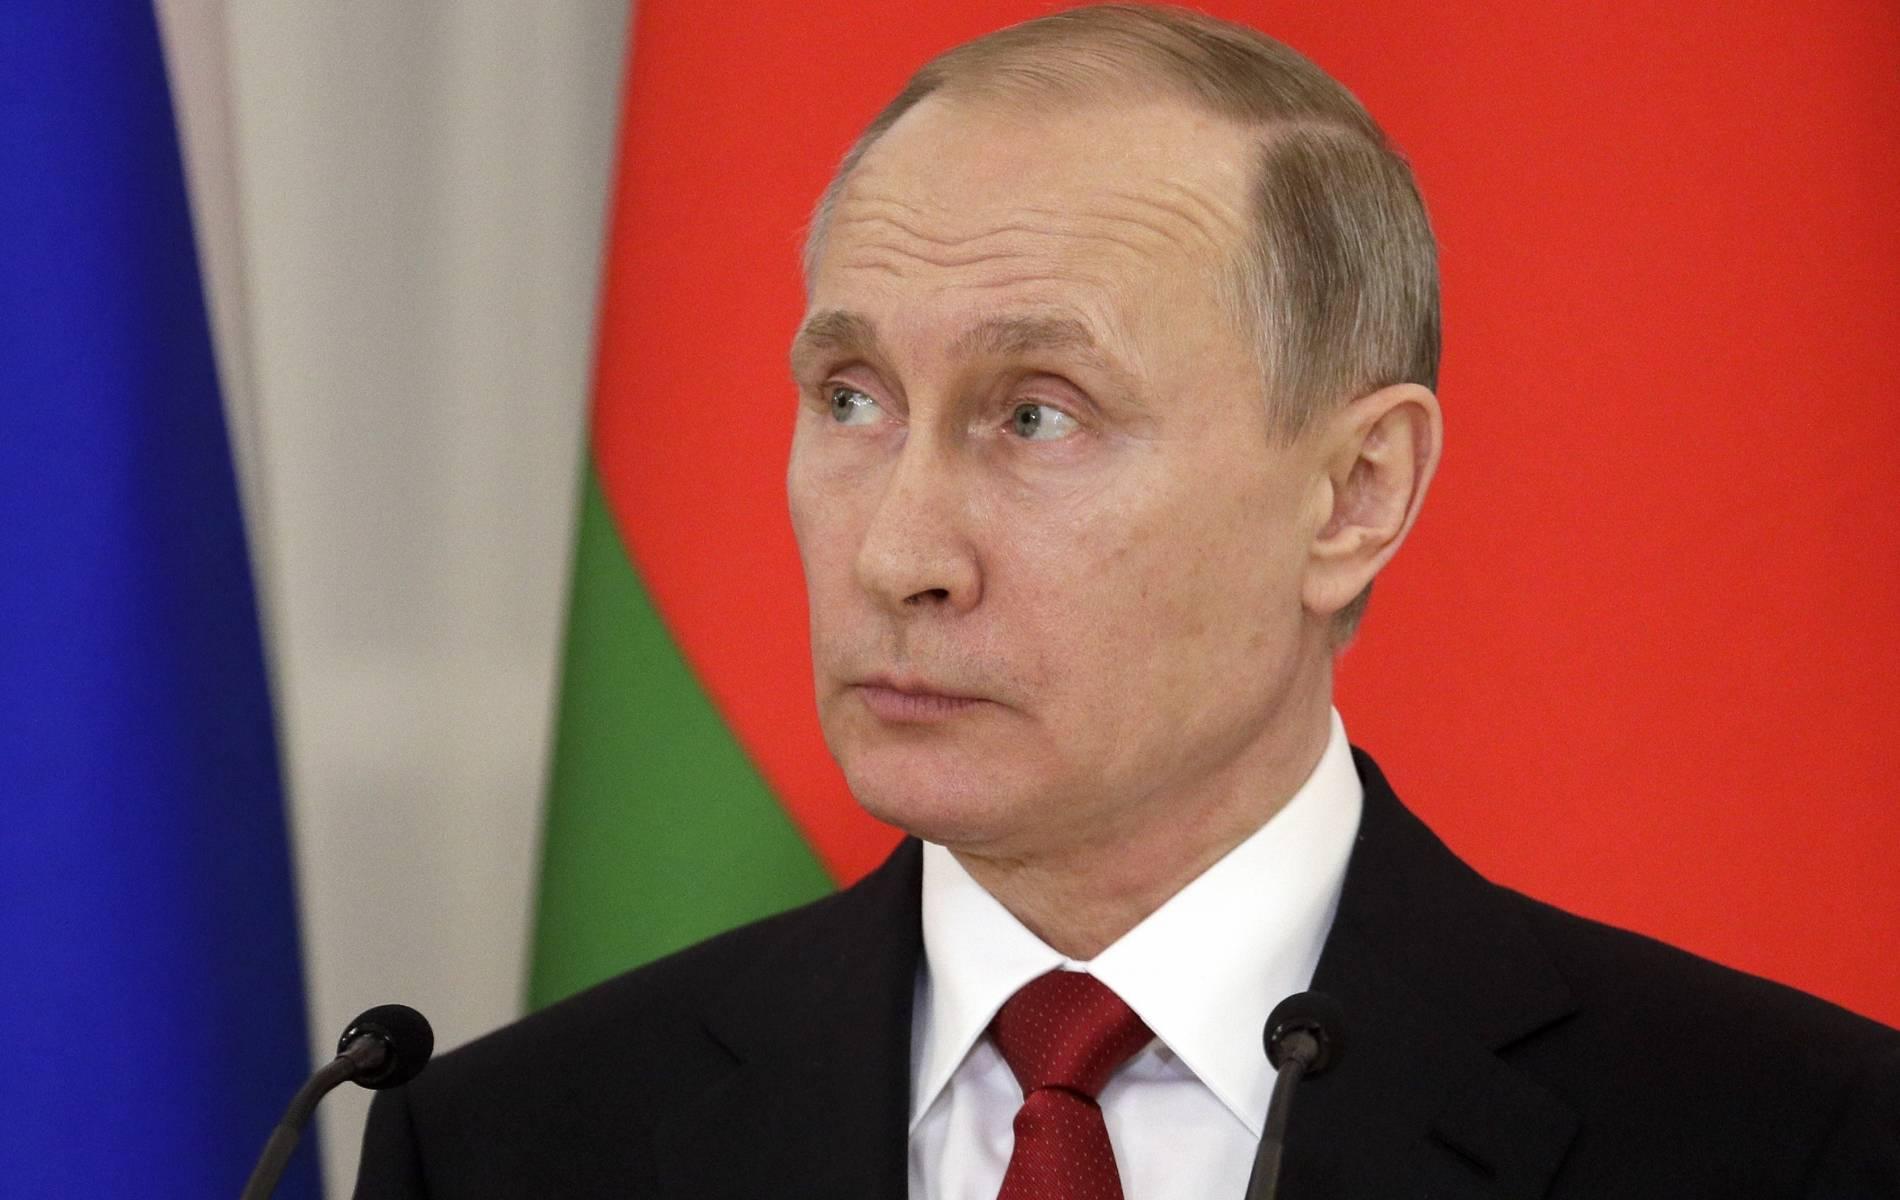 Putin the men